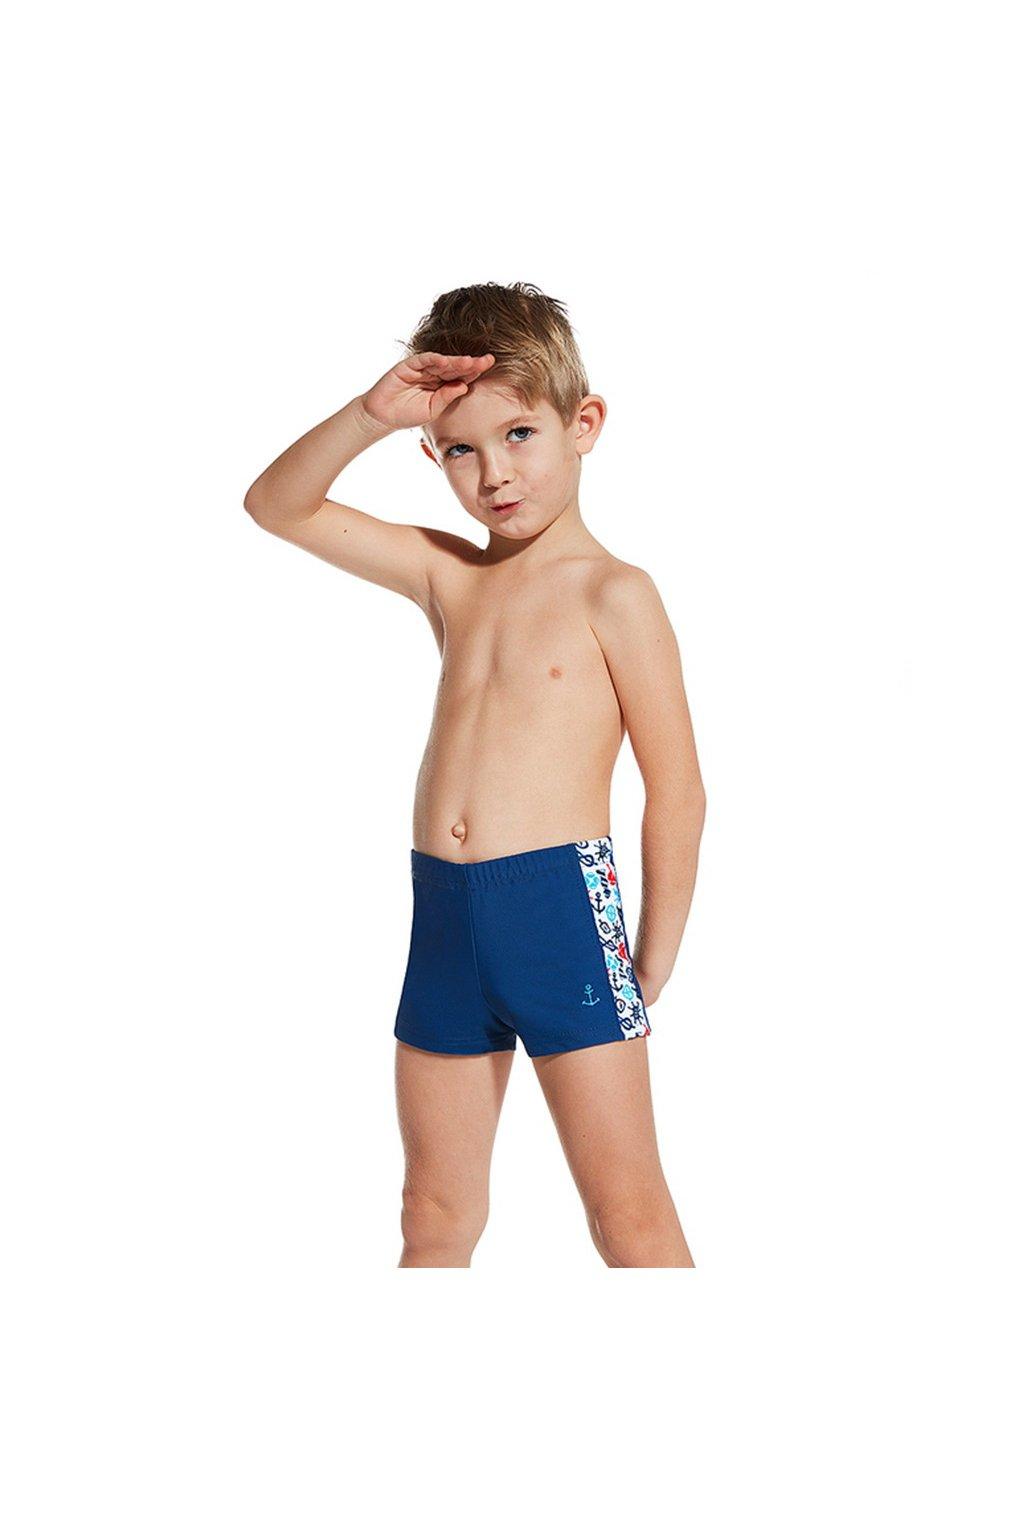 Chlapecké plavky Cornette 807 23 - Pradlonatelo.cz ceb0bac8b1